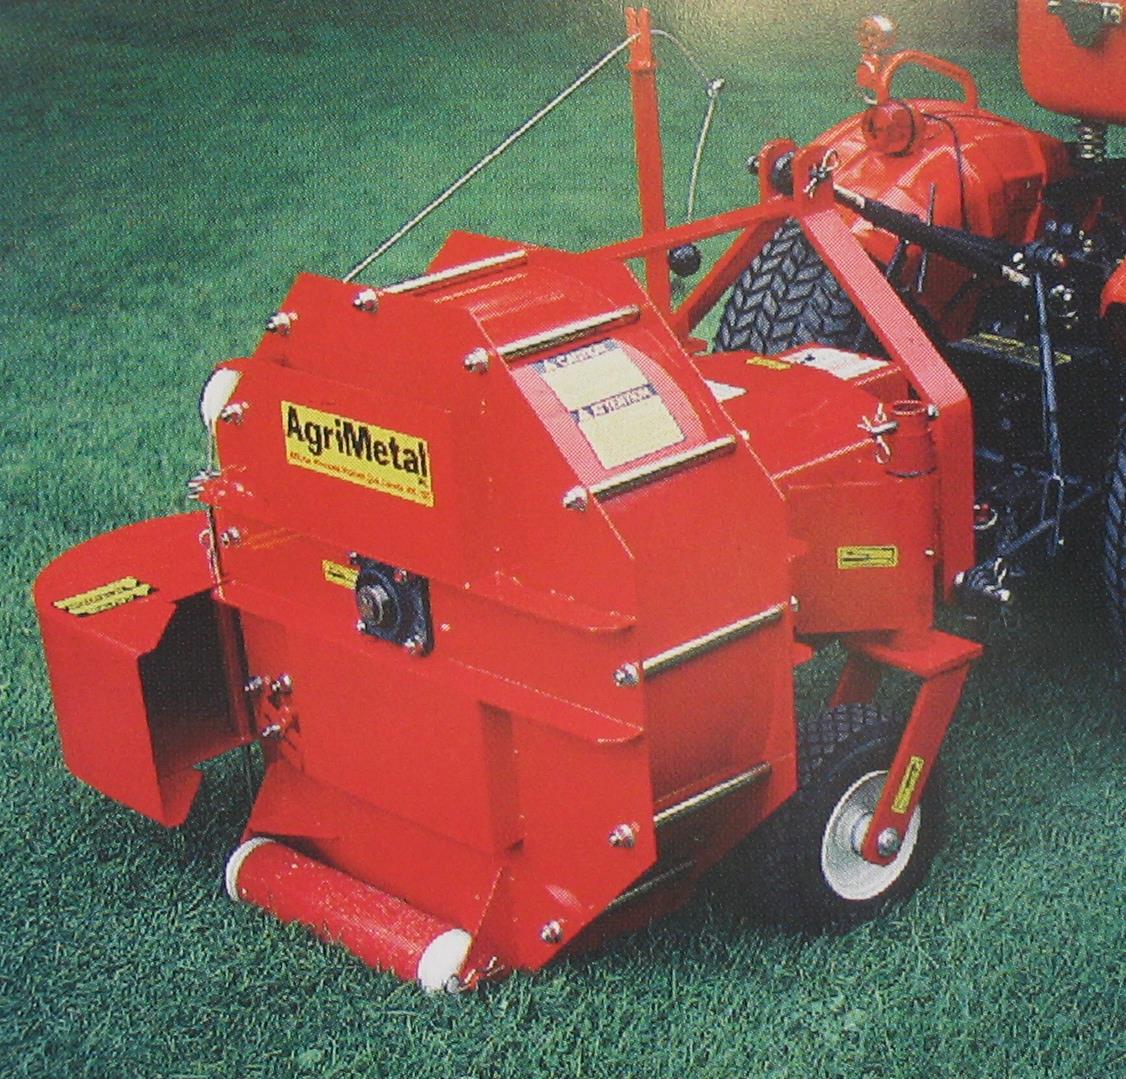 Force One Blower : Tractorland inc equipment dealer gormley on kioti ihi